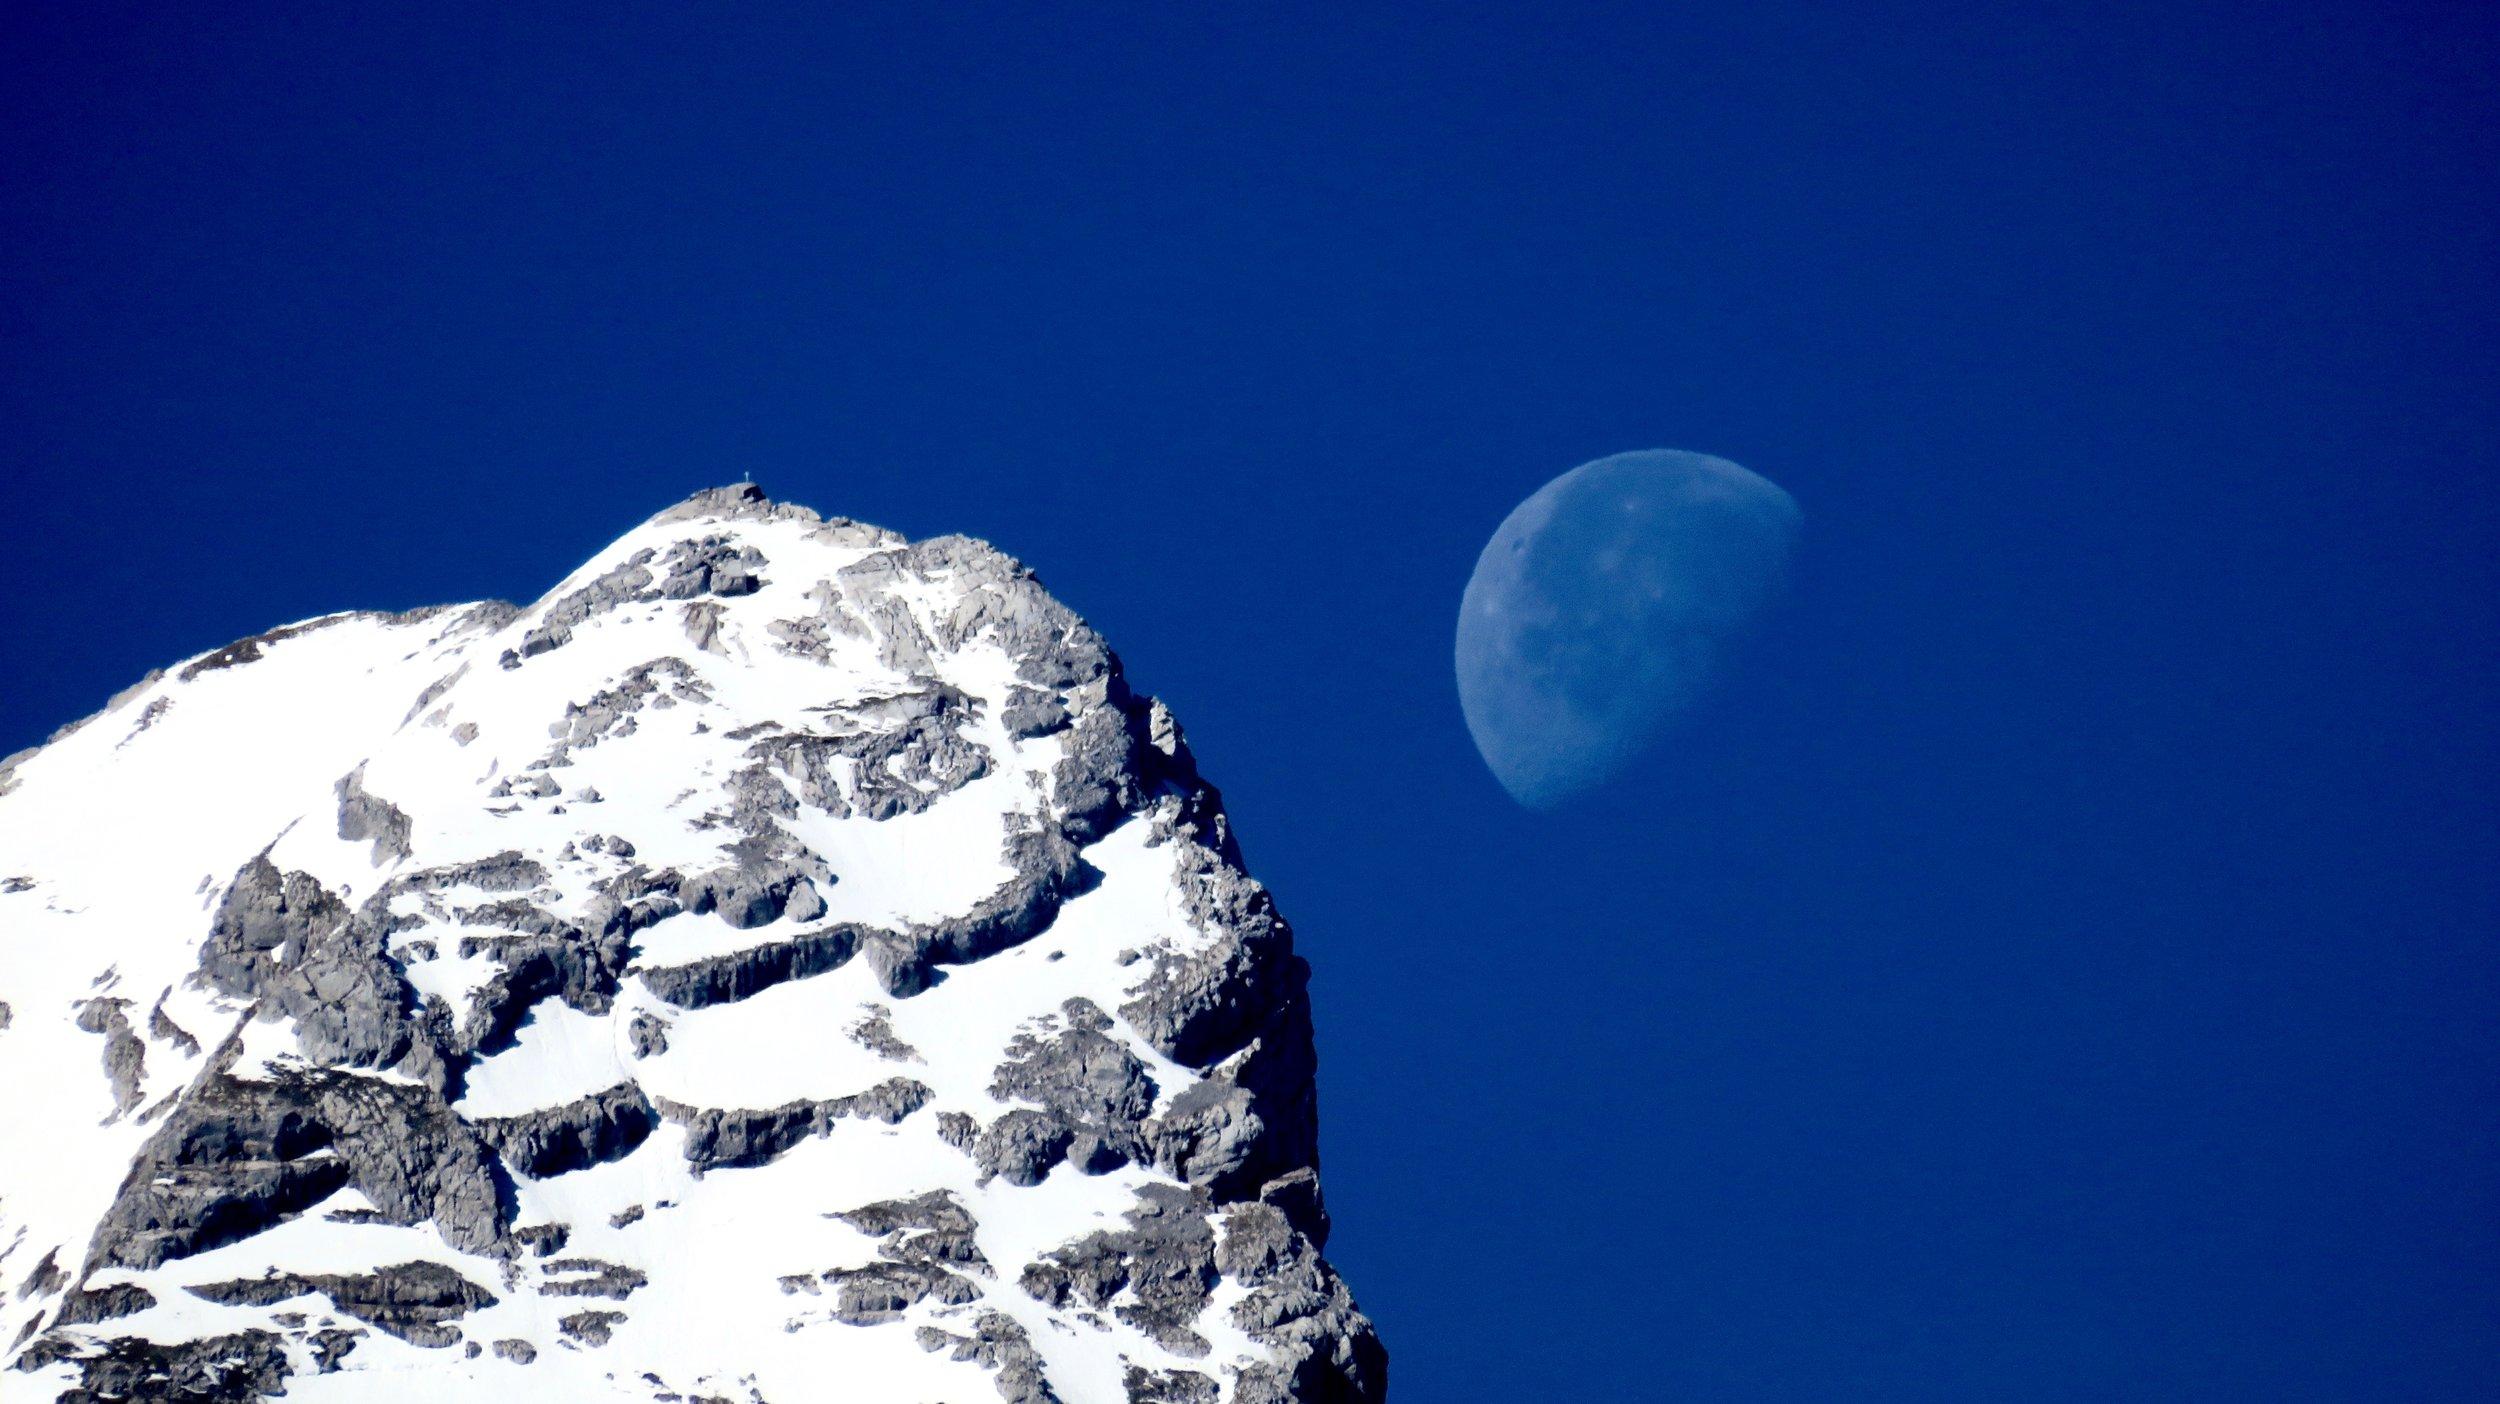 Moon & Mountains I